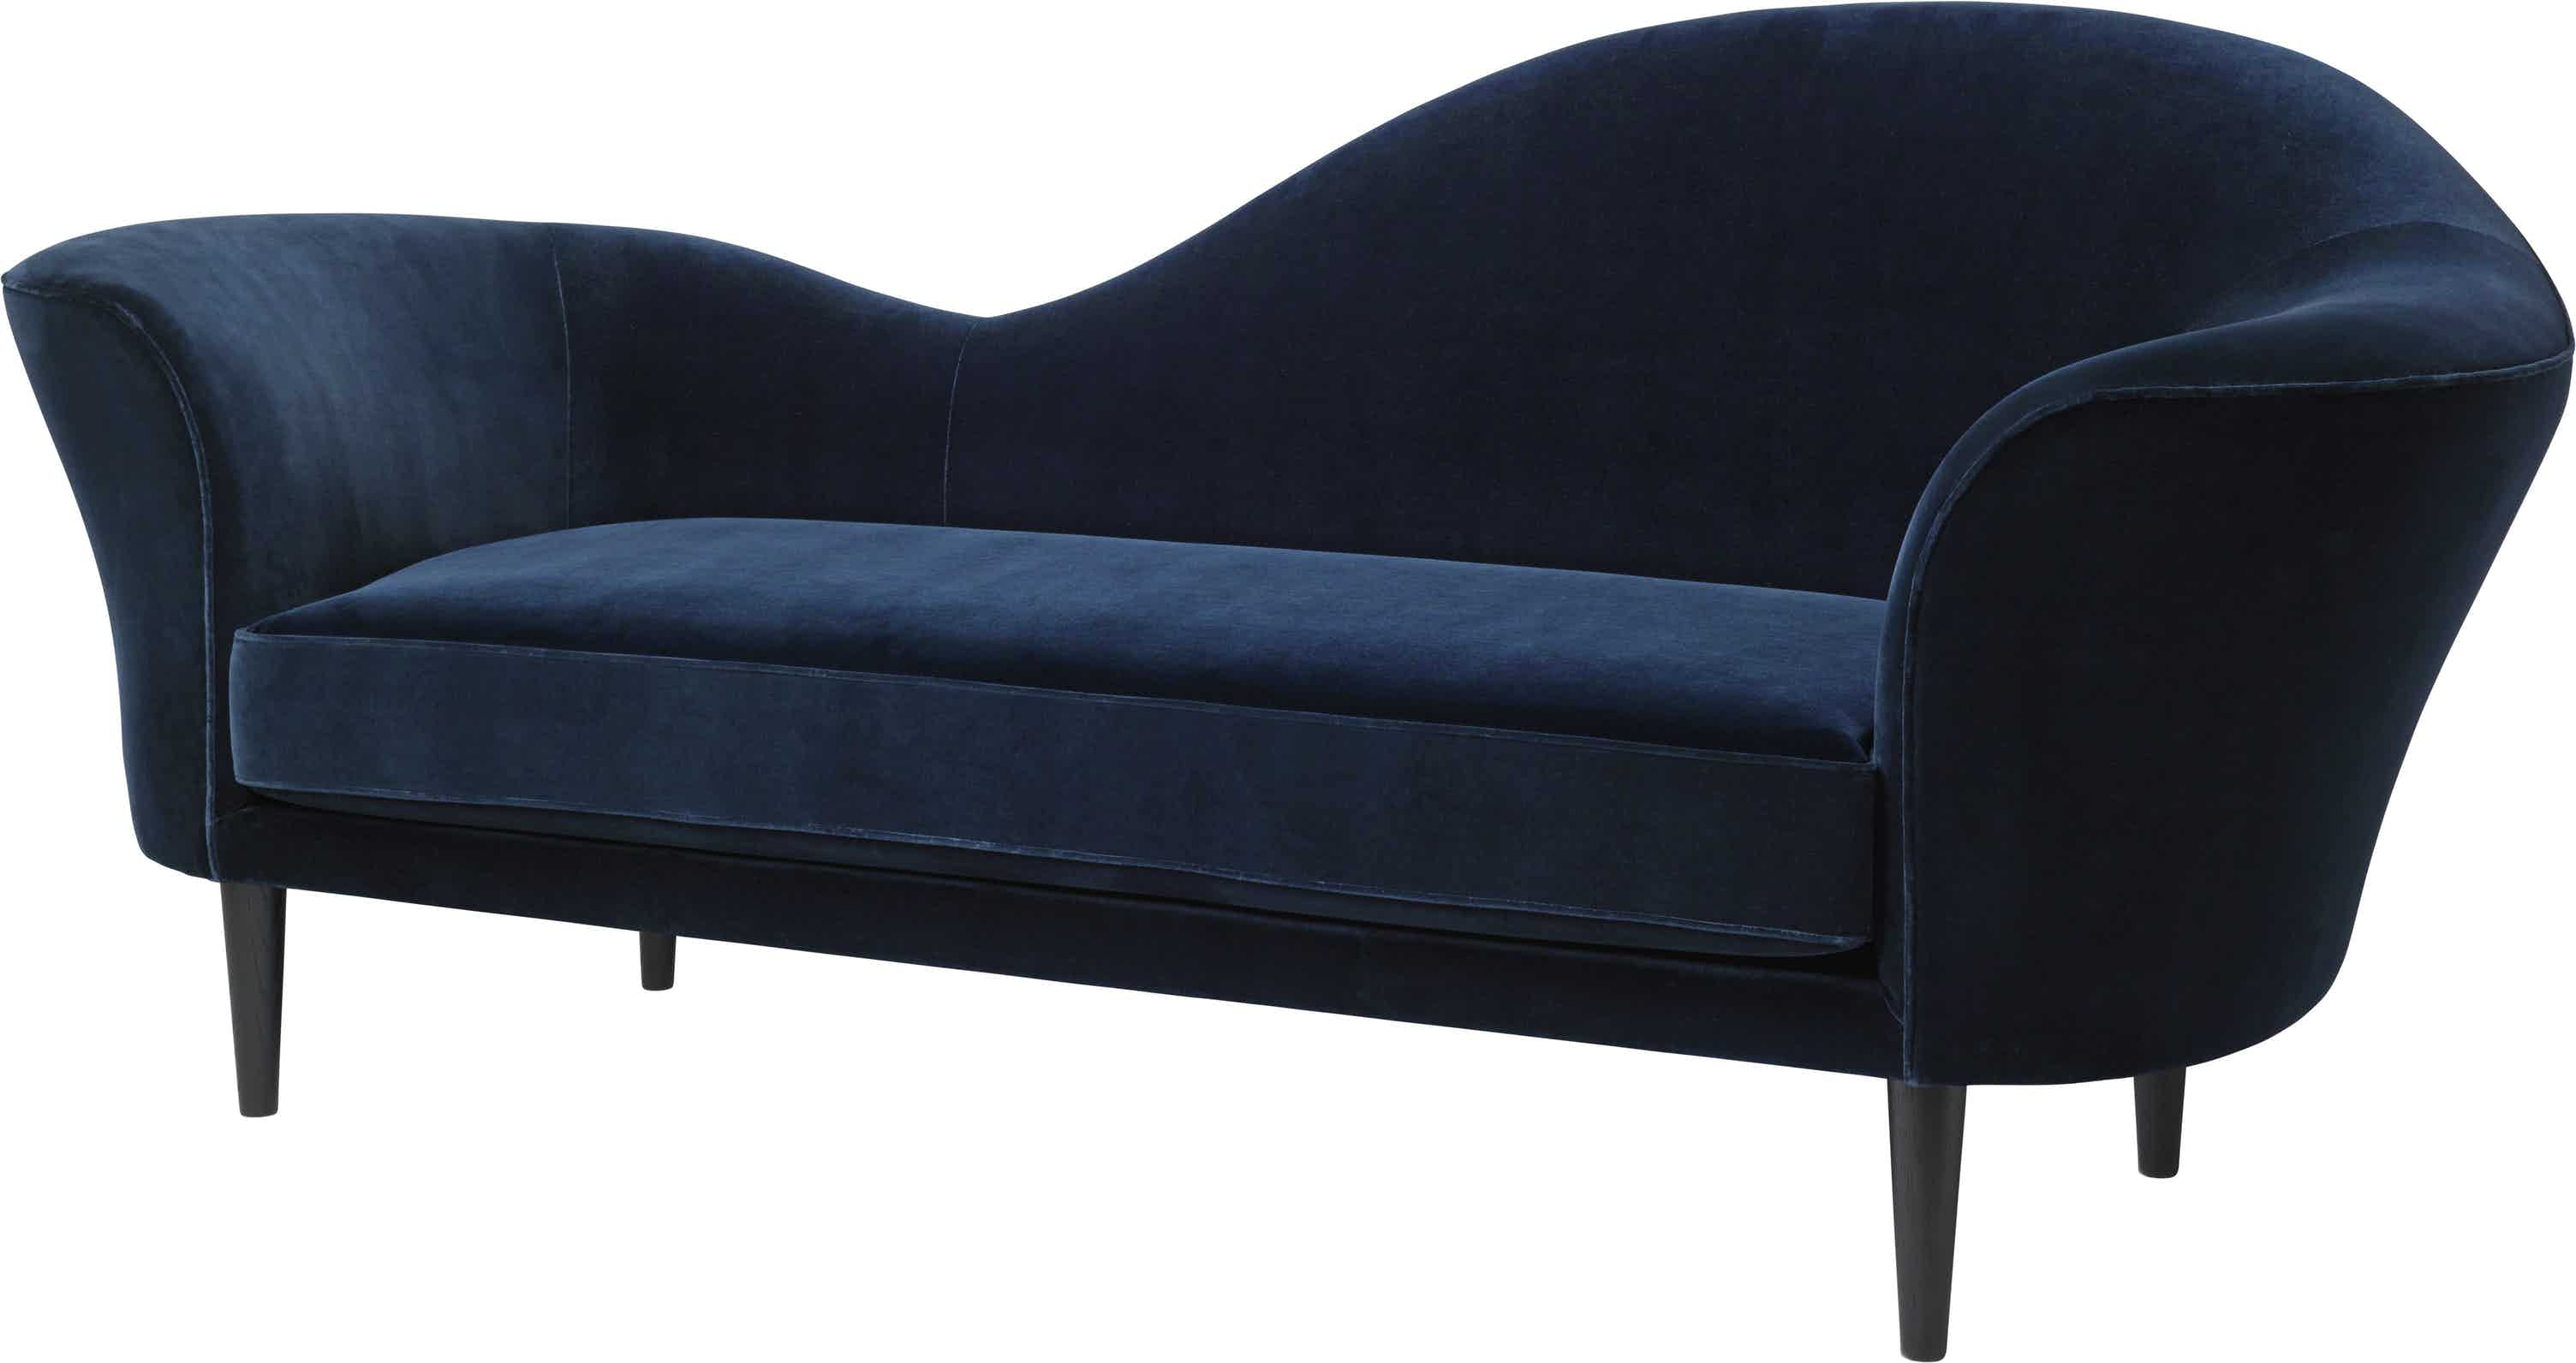 Grand Piano Sofa By Gubi Haute Living